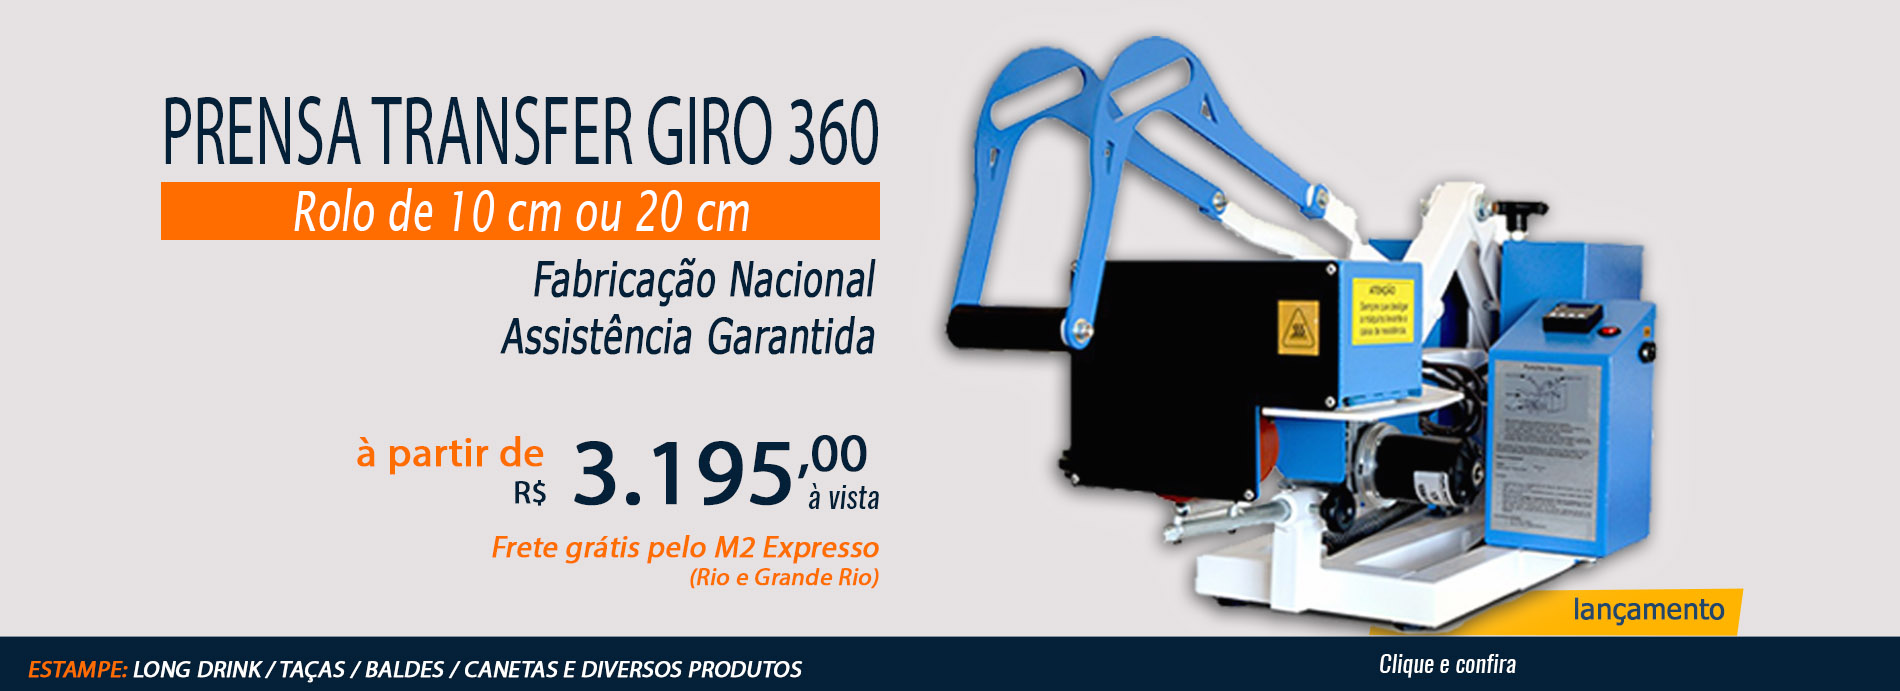 Prensa Transfer Giro 360